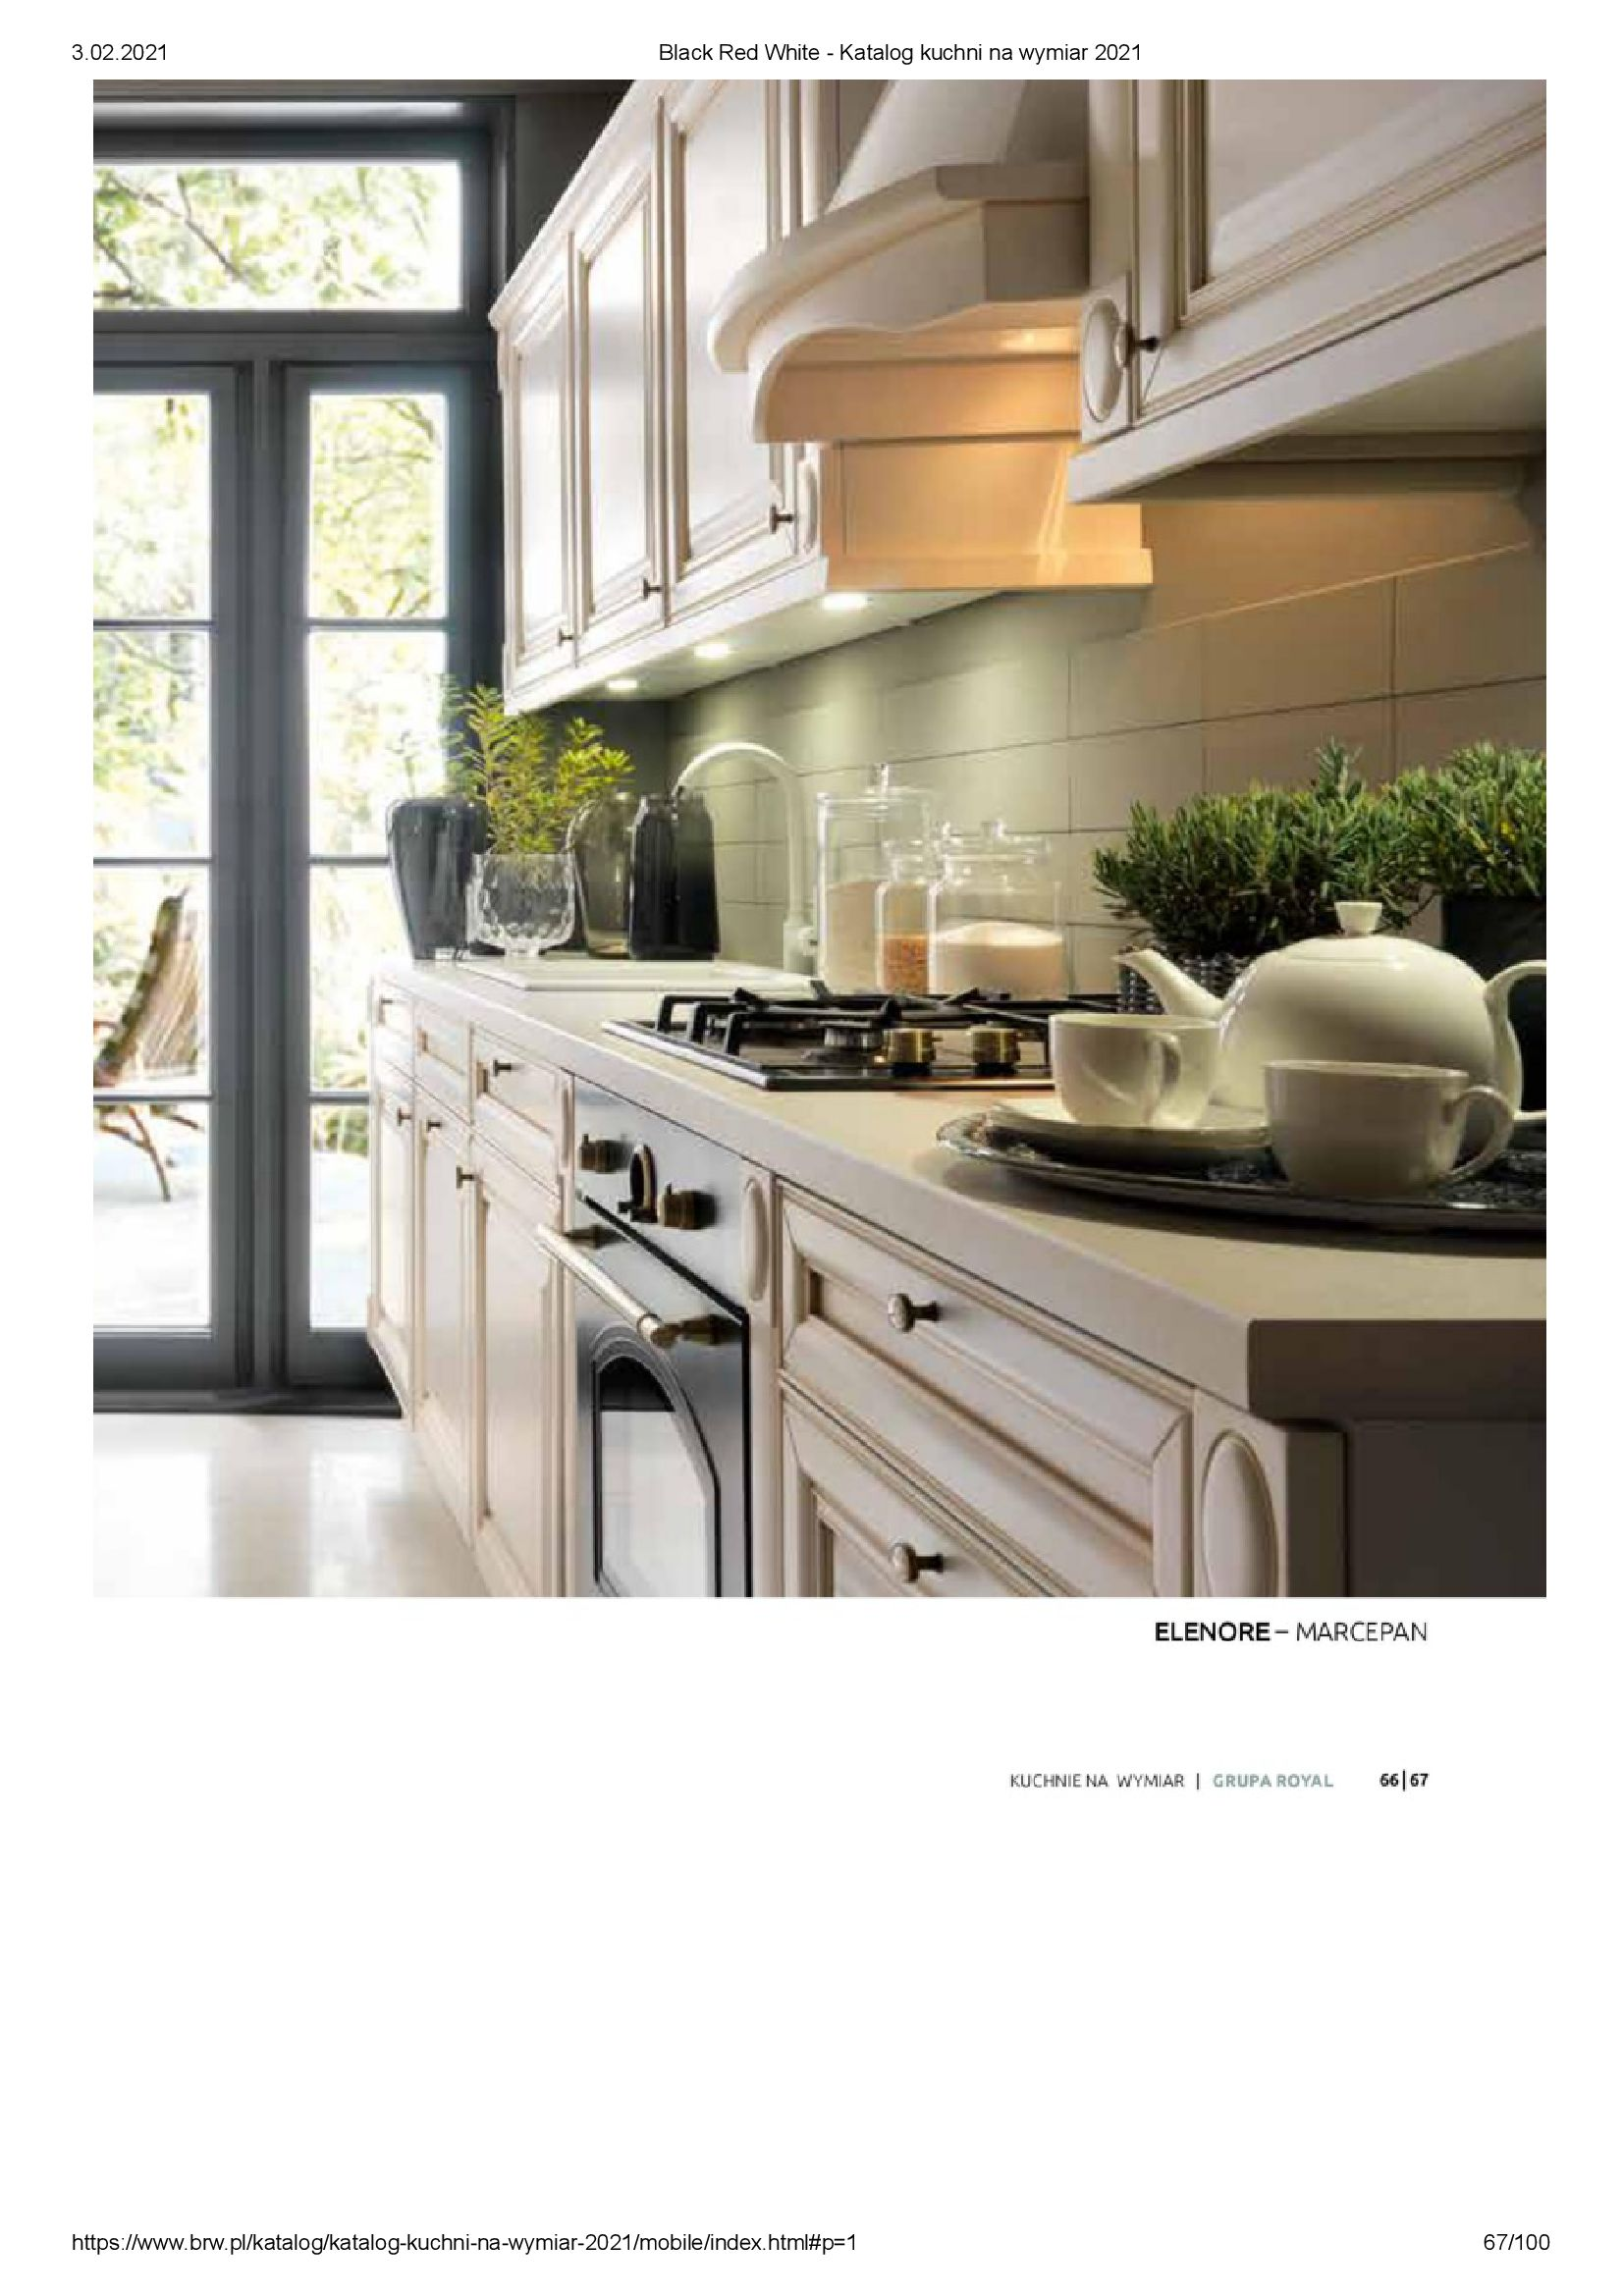 Gazetka Black Red White: Katalog - Kuchnie na wymiar Senso Kitchens 2021 2021-01-01 page-67